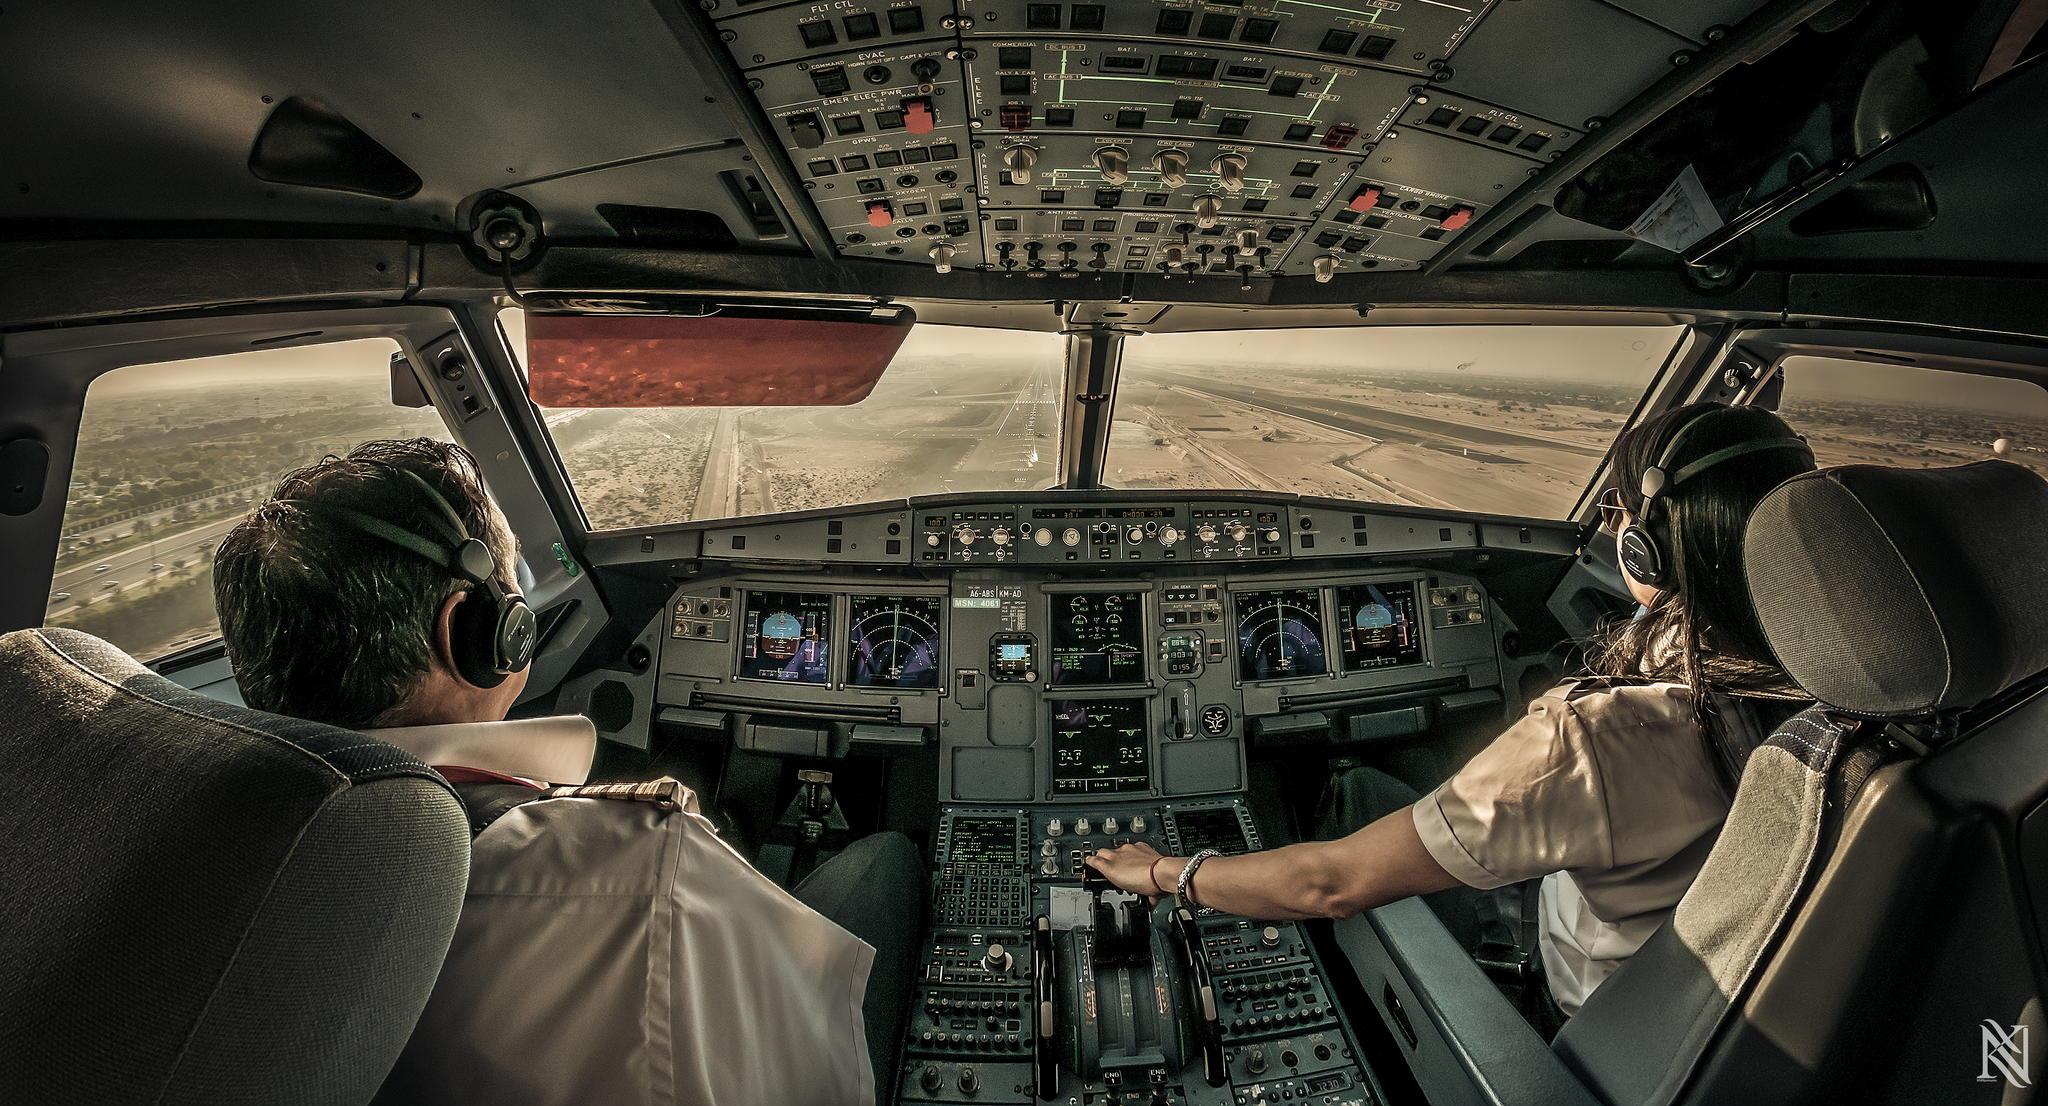 Some amazing aircraft photos!